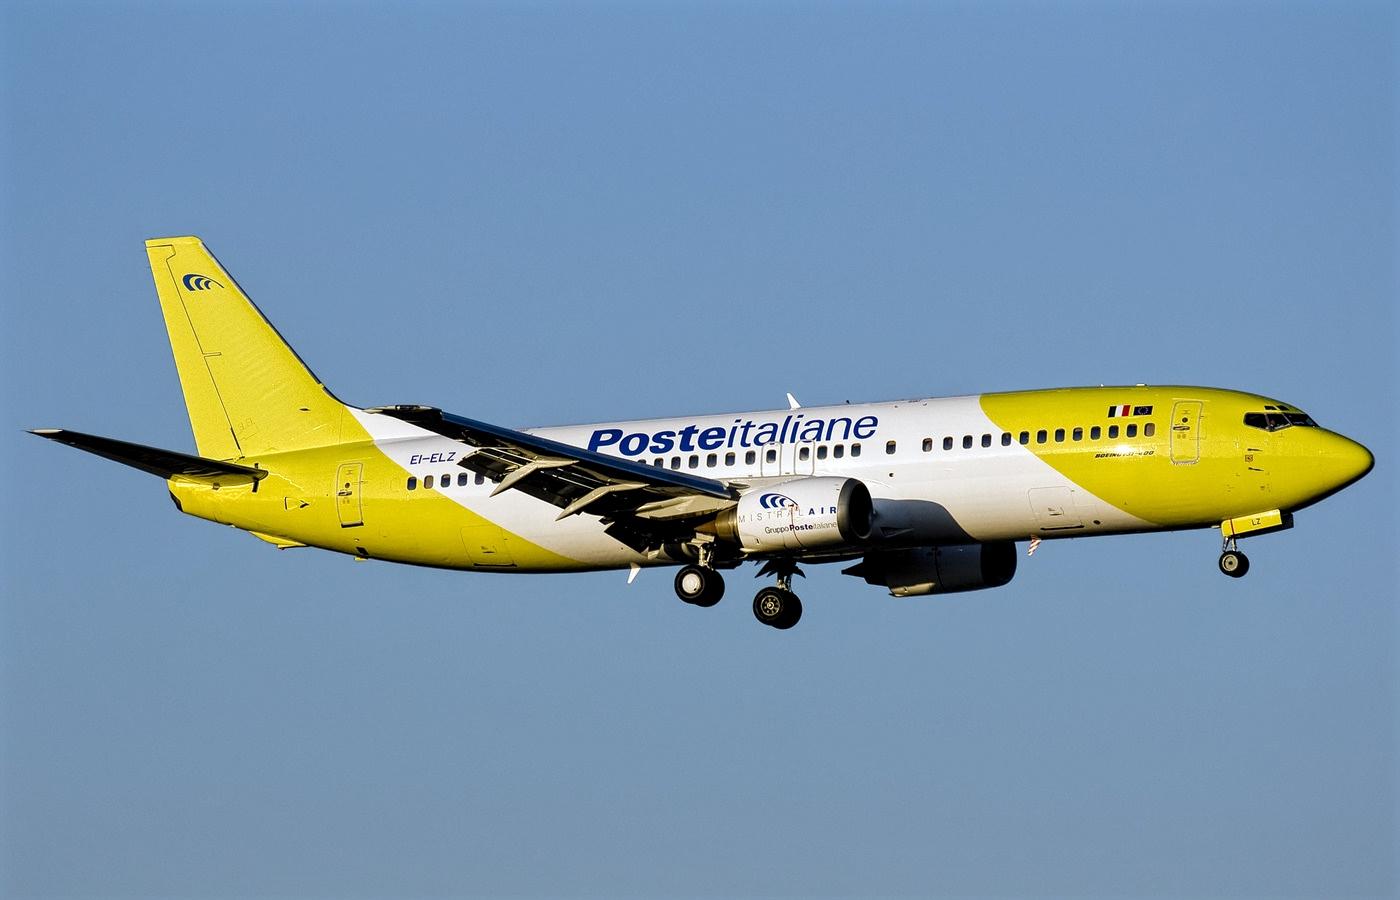 Mistral Air PosteItaliane Boeing 737-400